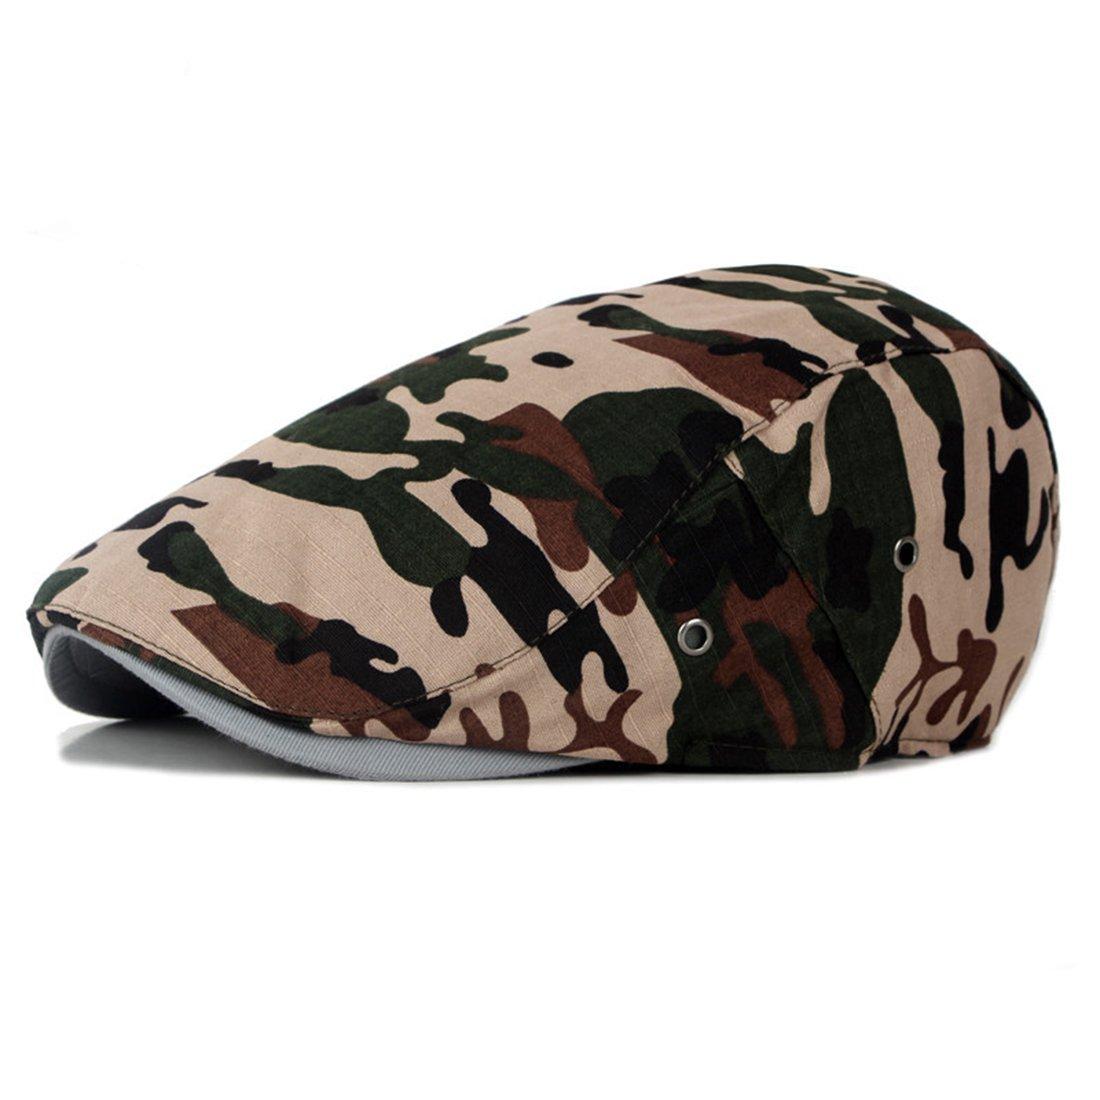 Newsboy Cap Military Camouflage Flat Cap Duckbill Hat Ivy Irish Gatsby Caps